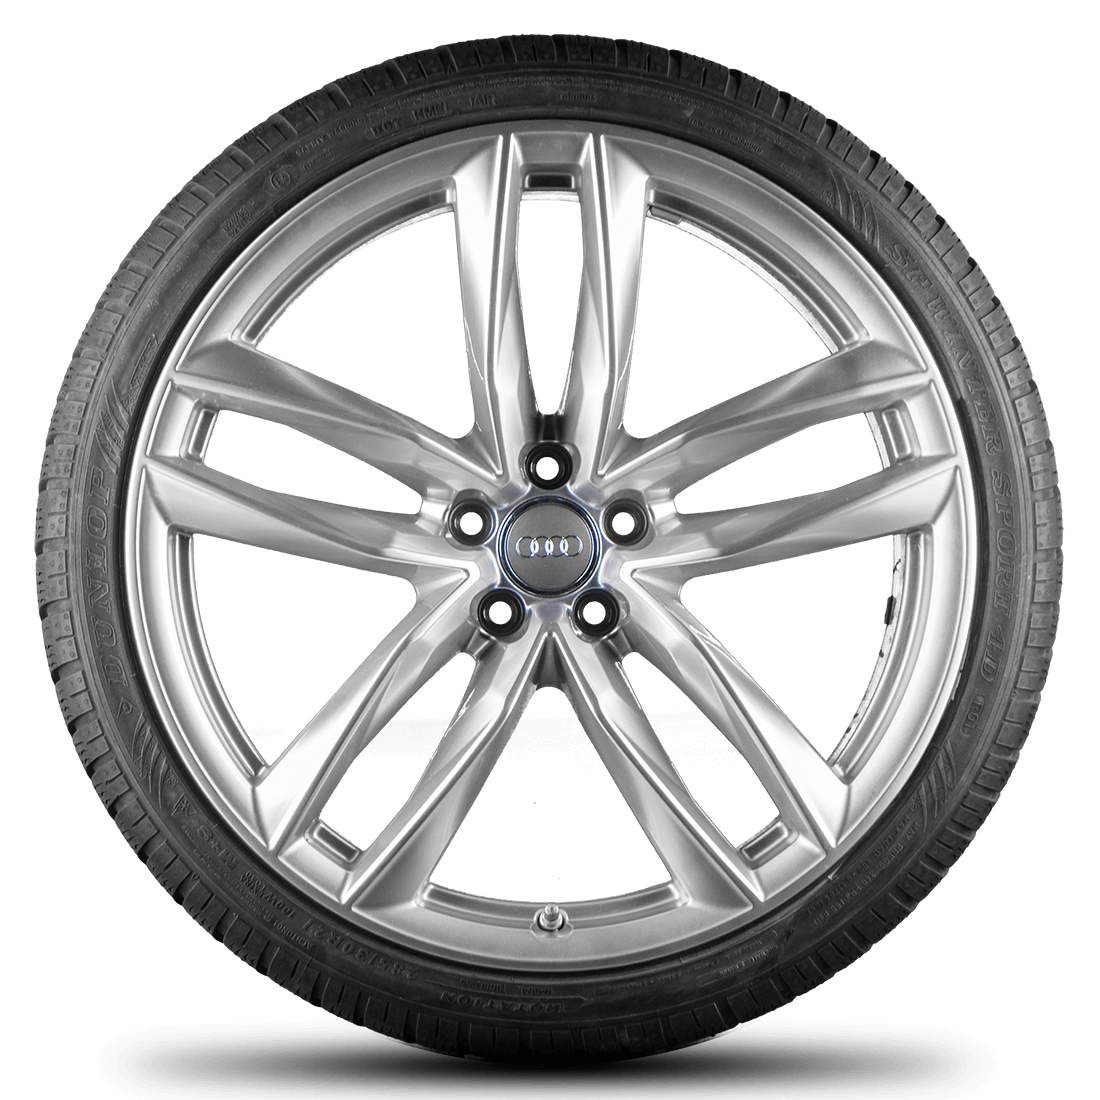 Original Audi RS6 4G 21 Zoll Alufelgen Felgen S line Winterreifen Winterräder